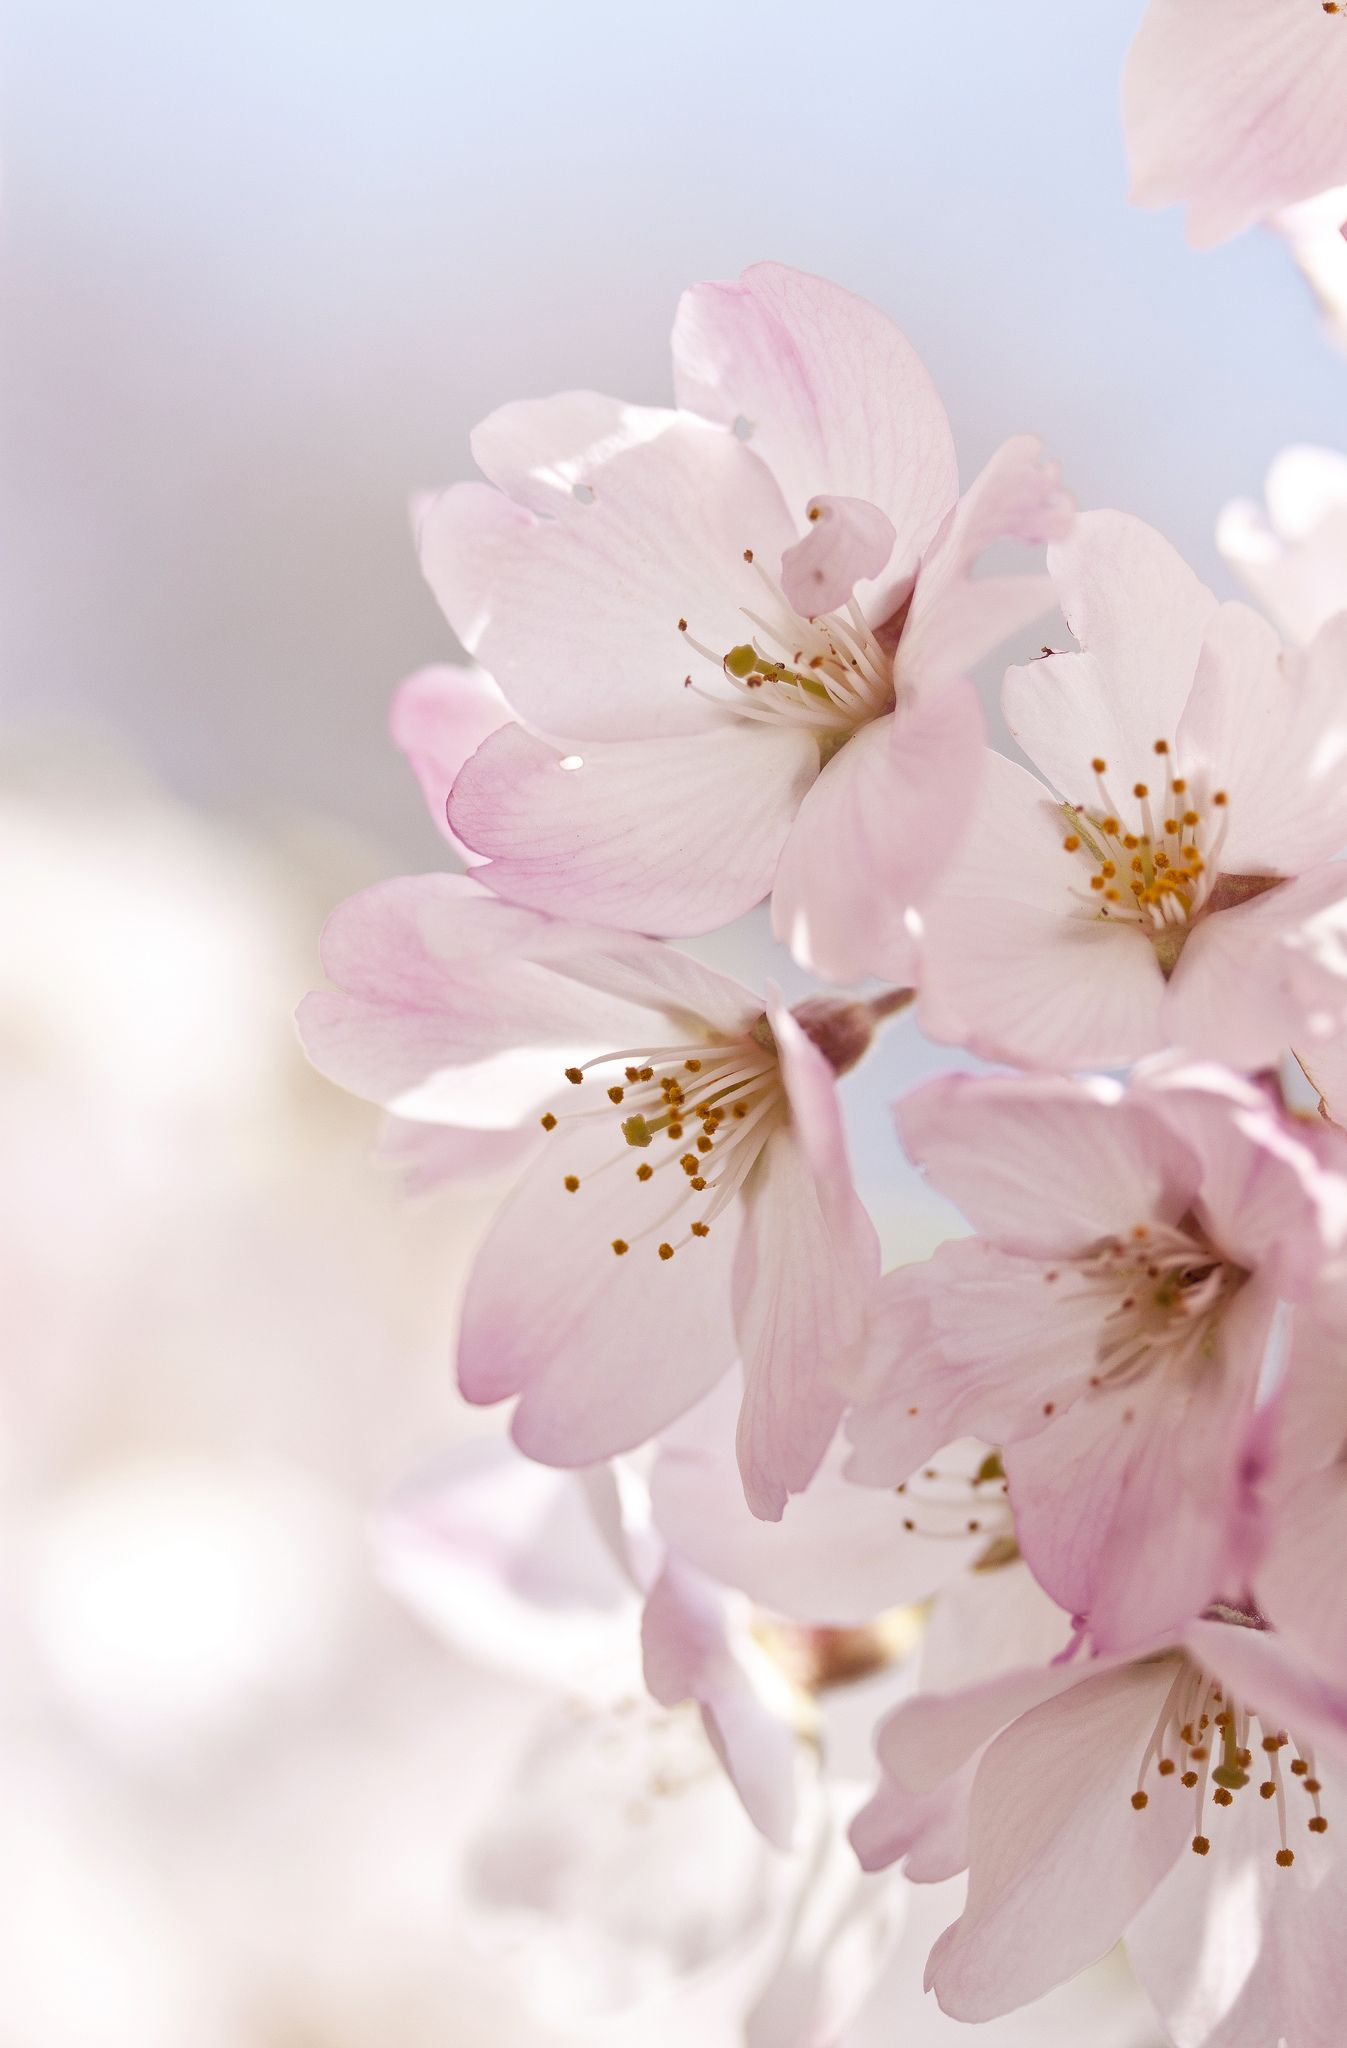 Flickr Blossom Trees Cherry Blossom Flowers Cherry Blossom Tree